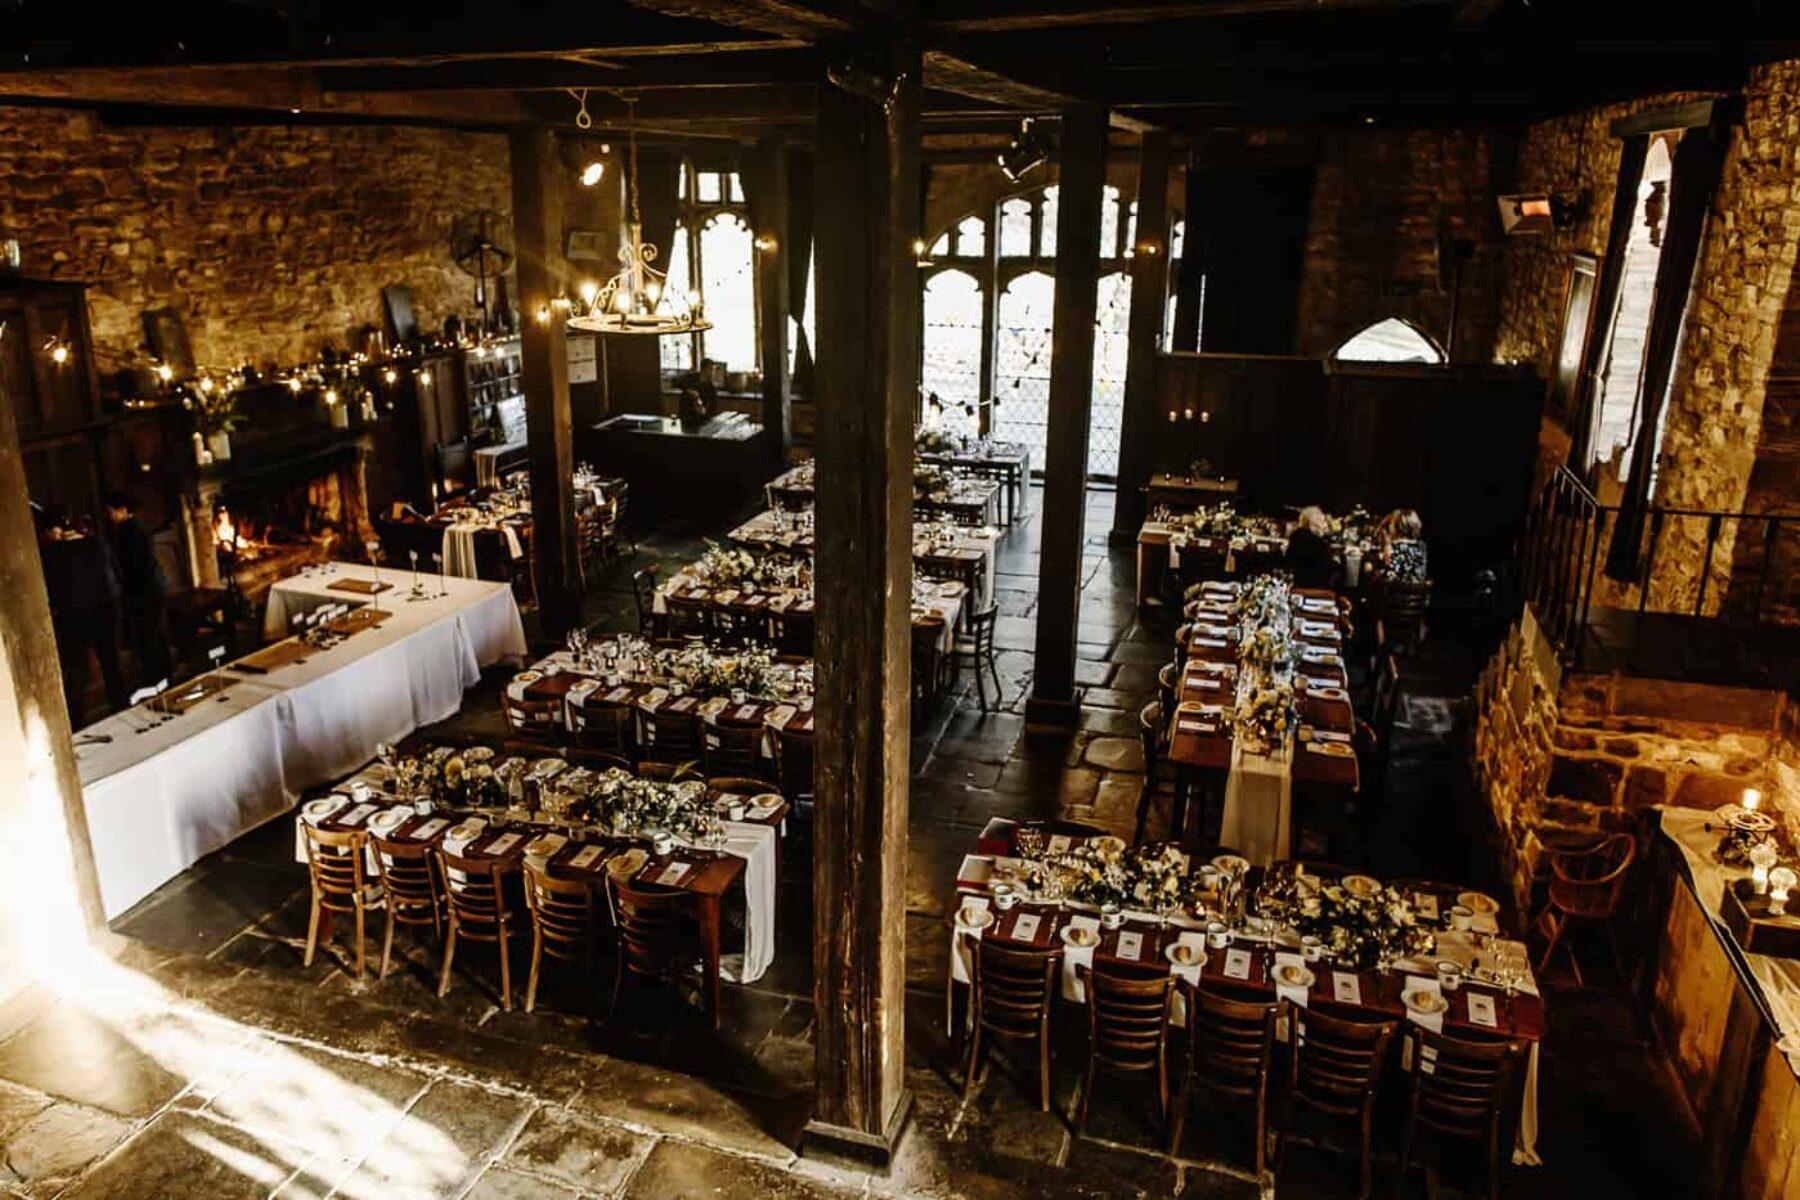 Harry Potter inspired wedding in Montsalvat's Great Hall